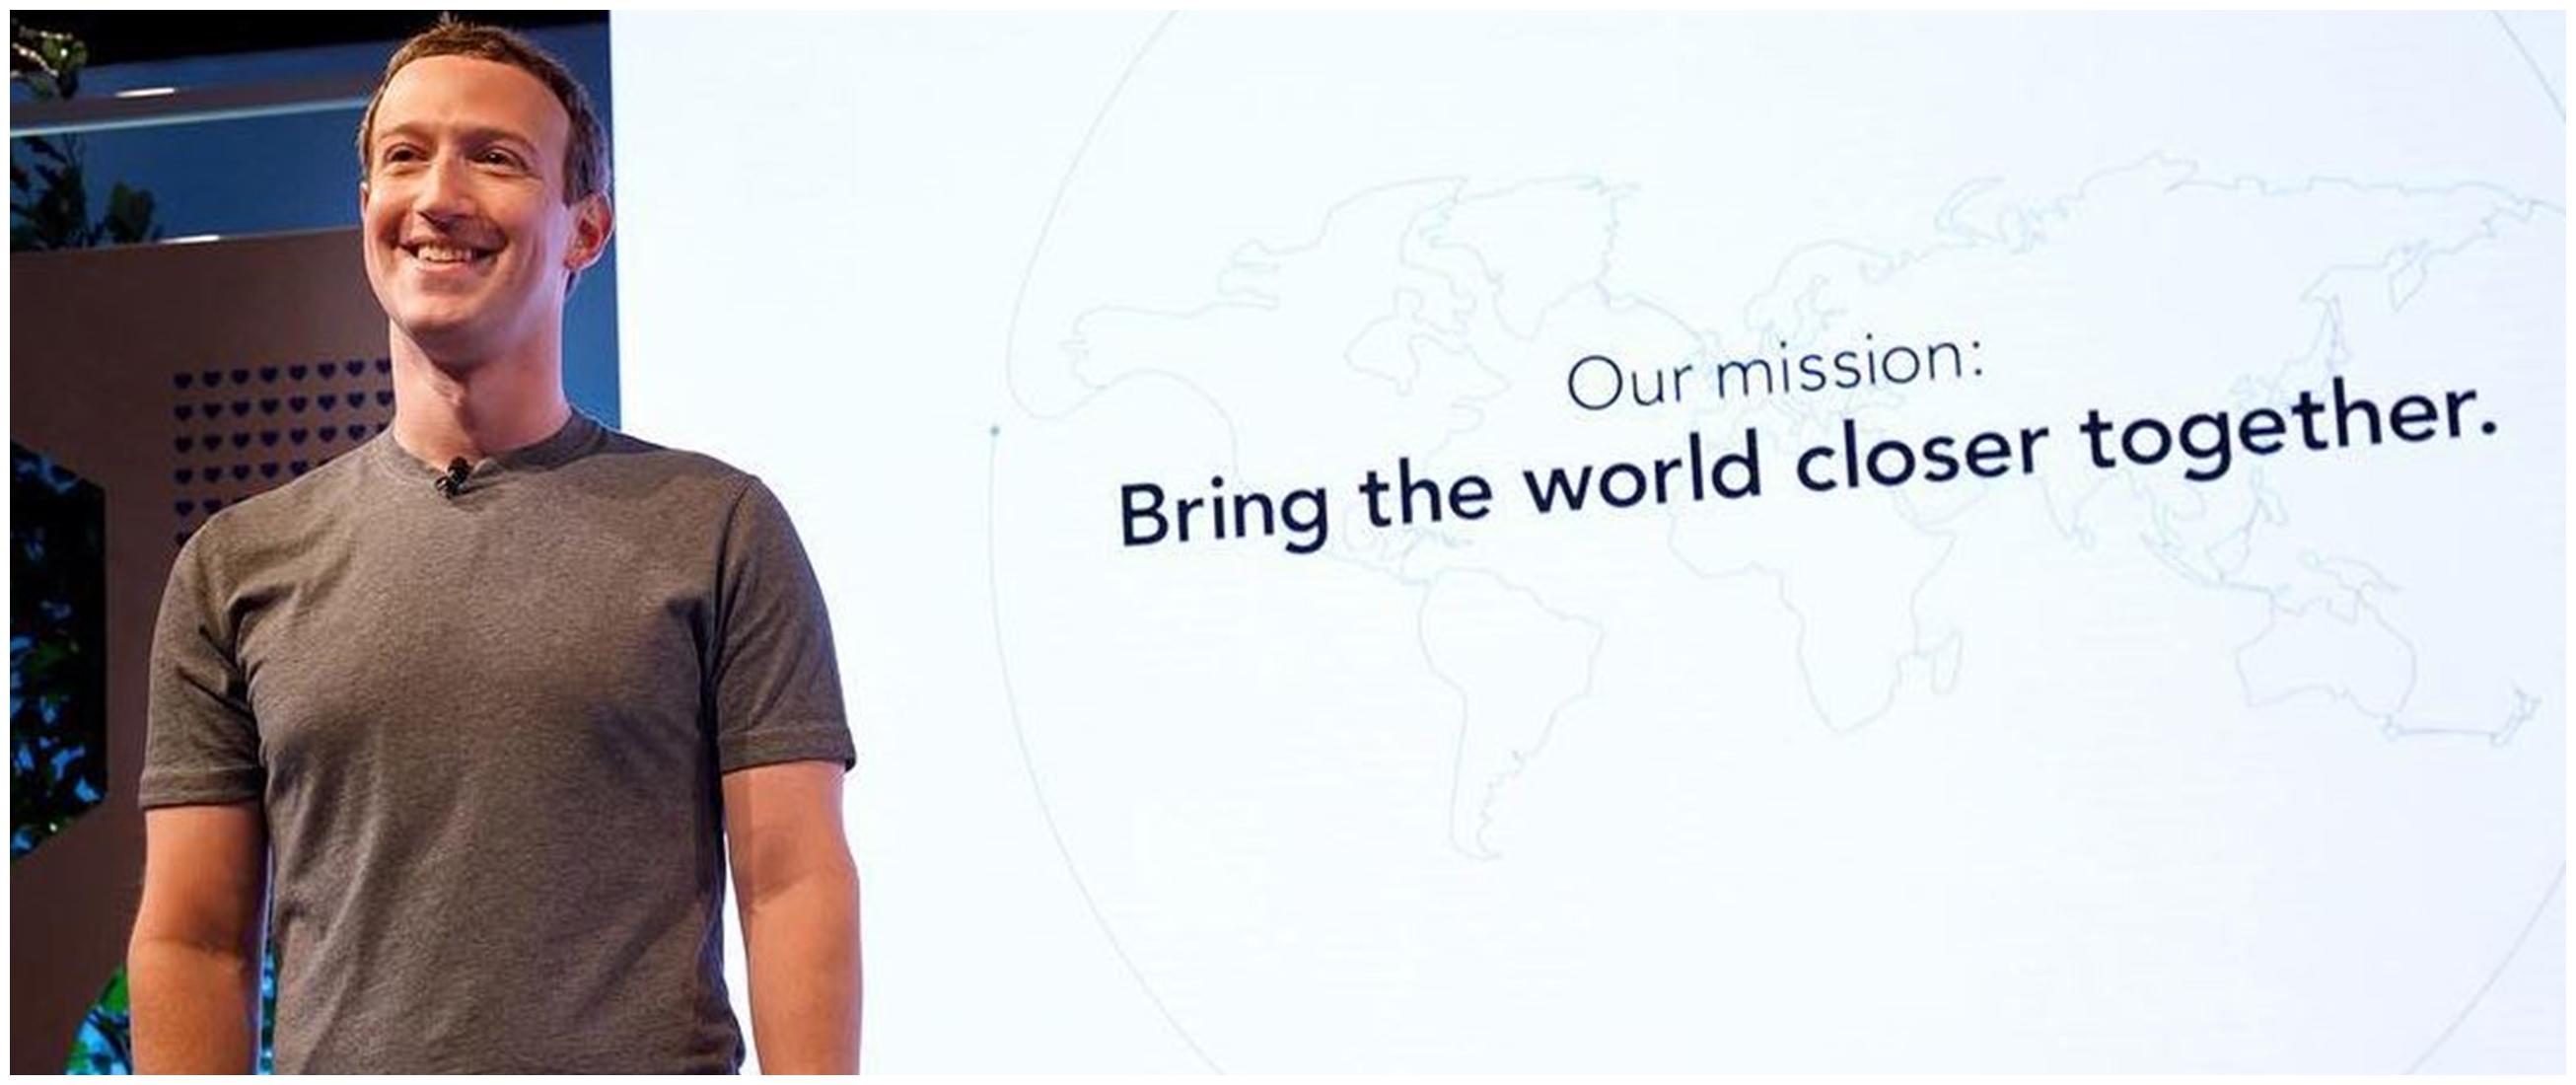 40 Kata-kata quote bijak motivasi Mark Zuckerberg, bikin semangat